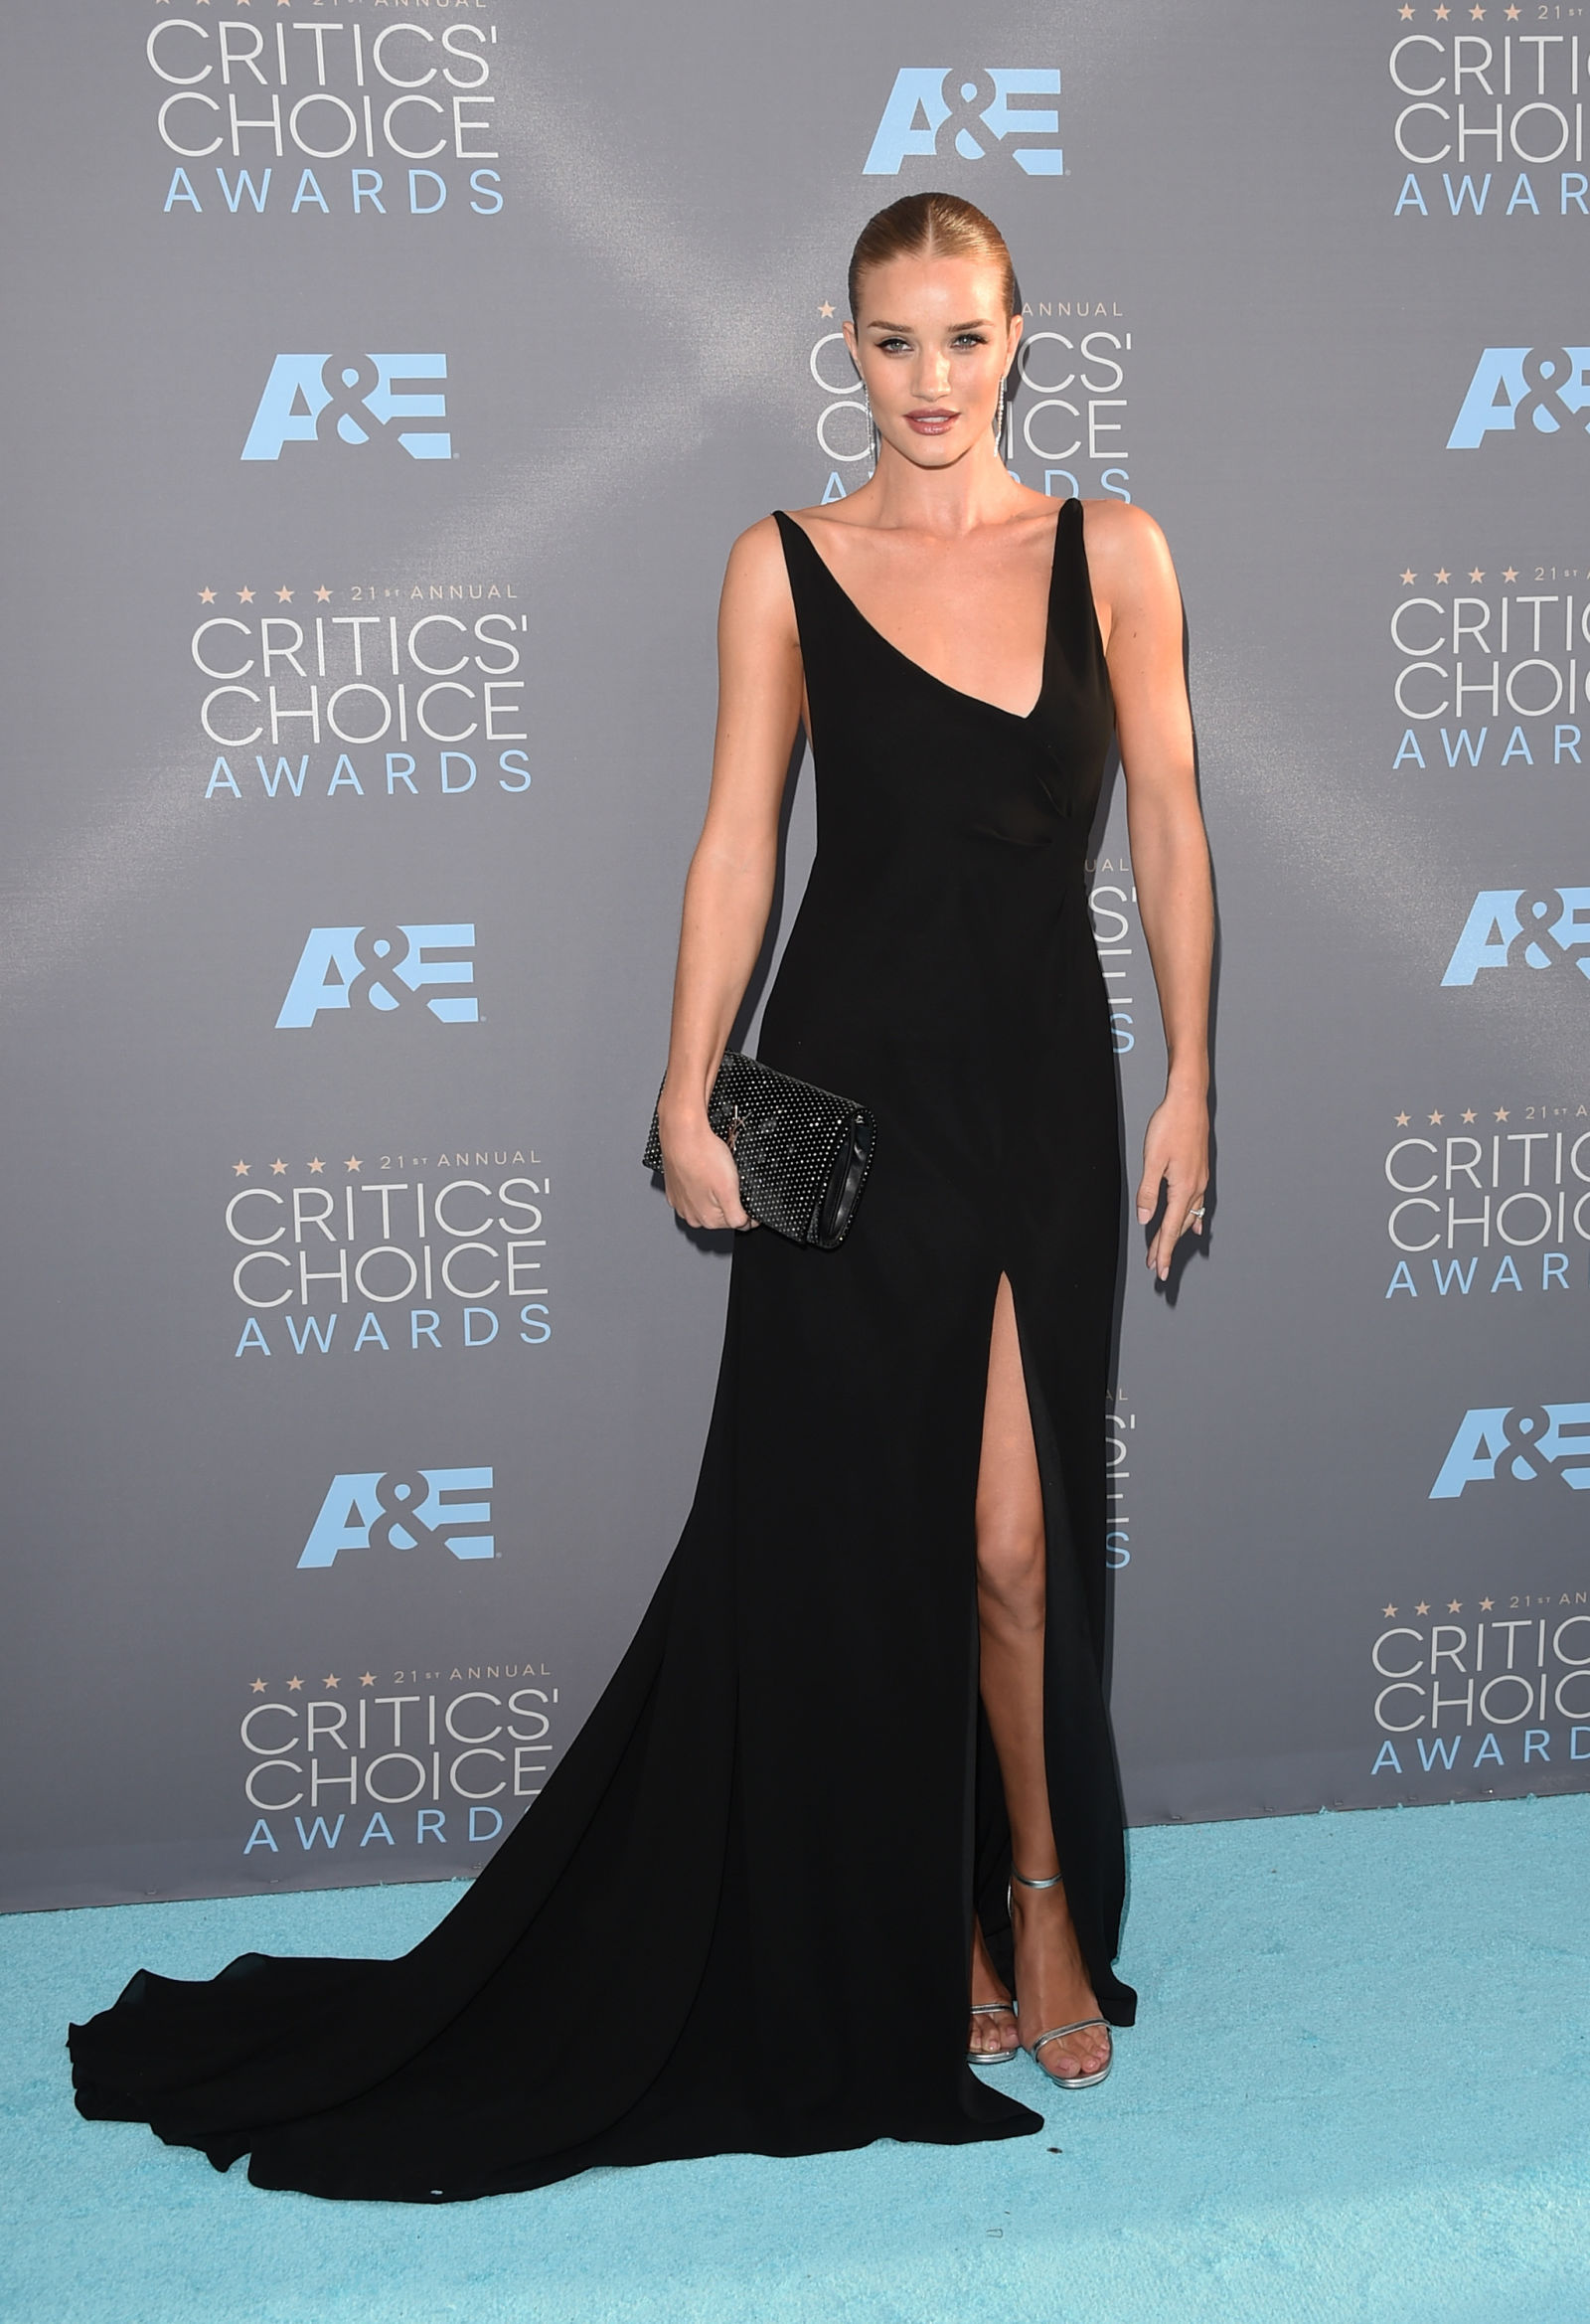 ROSIE HUNTINGTON-WHITELEY celebrity hairstyles 2016